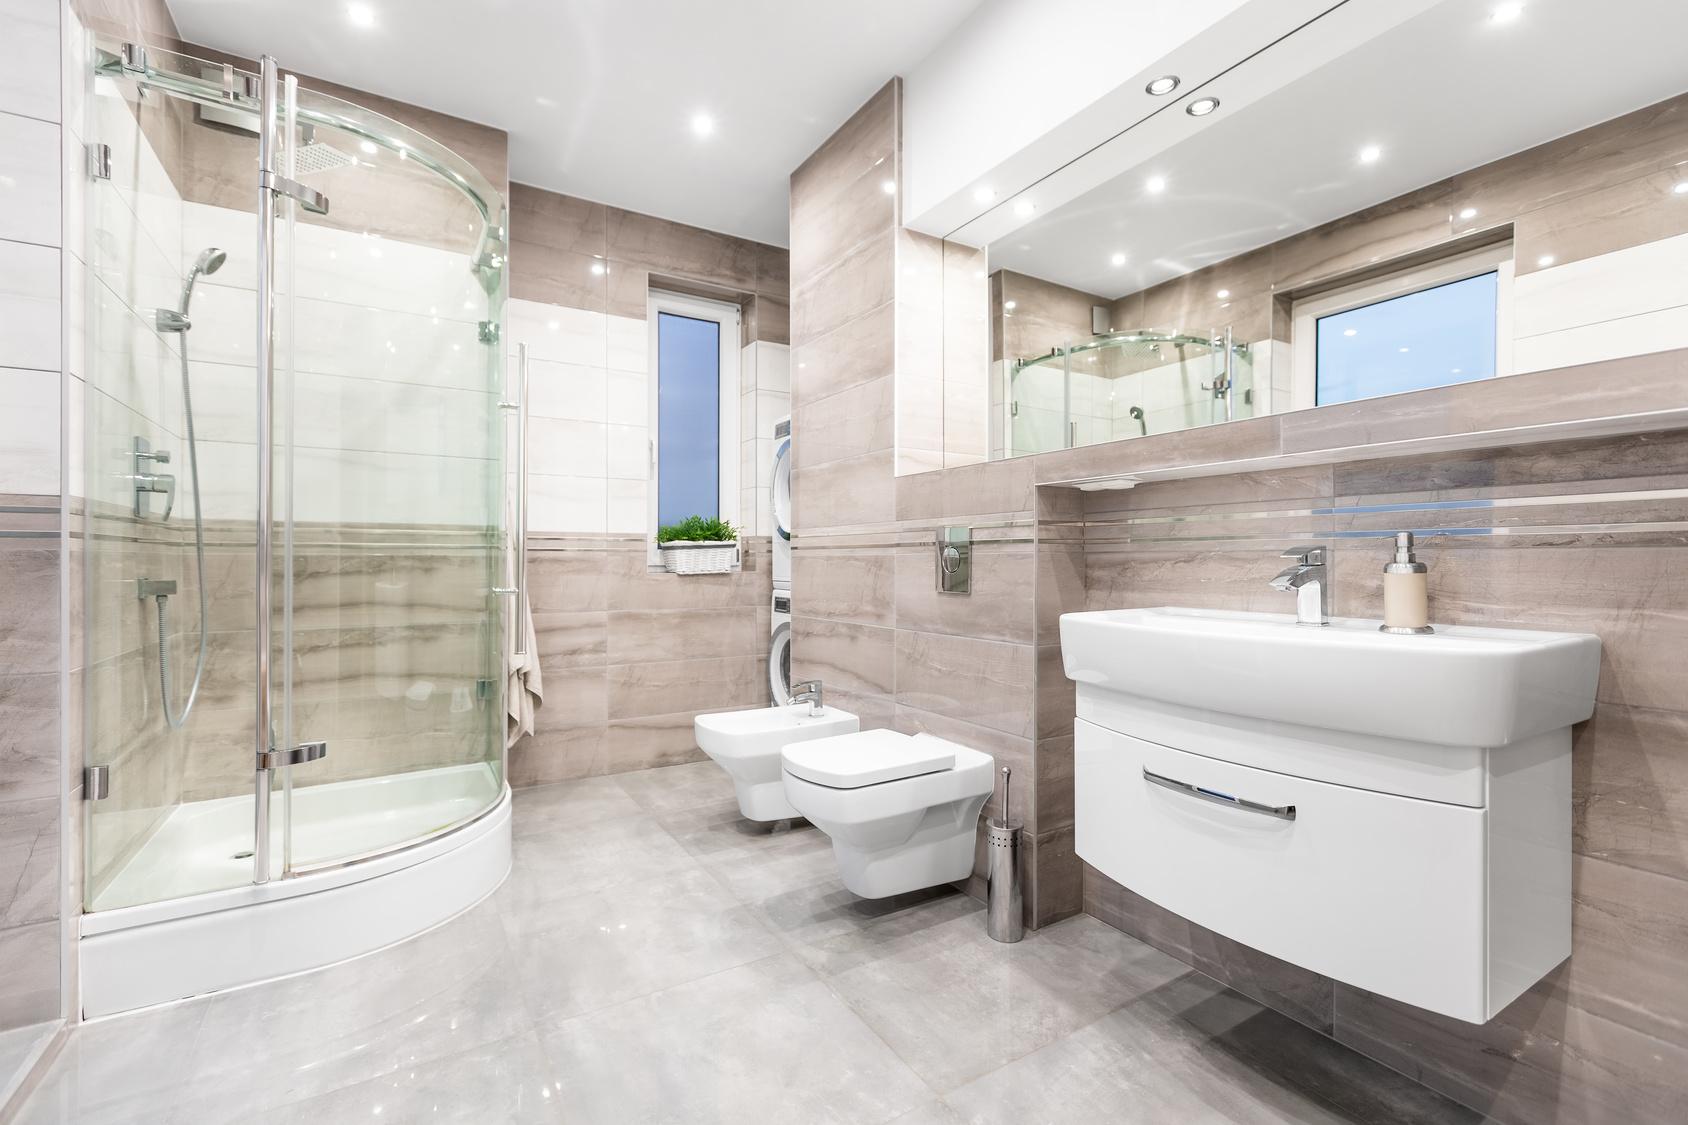 Modern beige bathroom with window, walk in shower, toilet, bidet, basin and large mirror